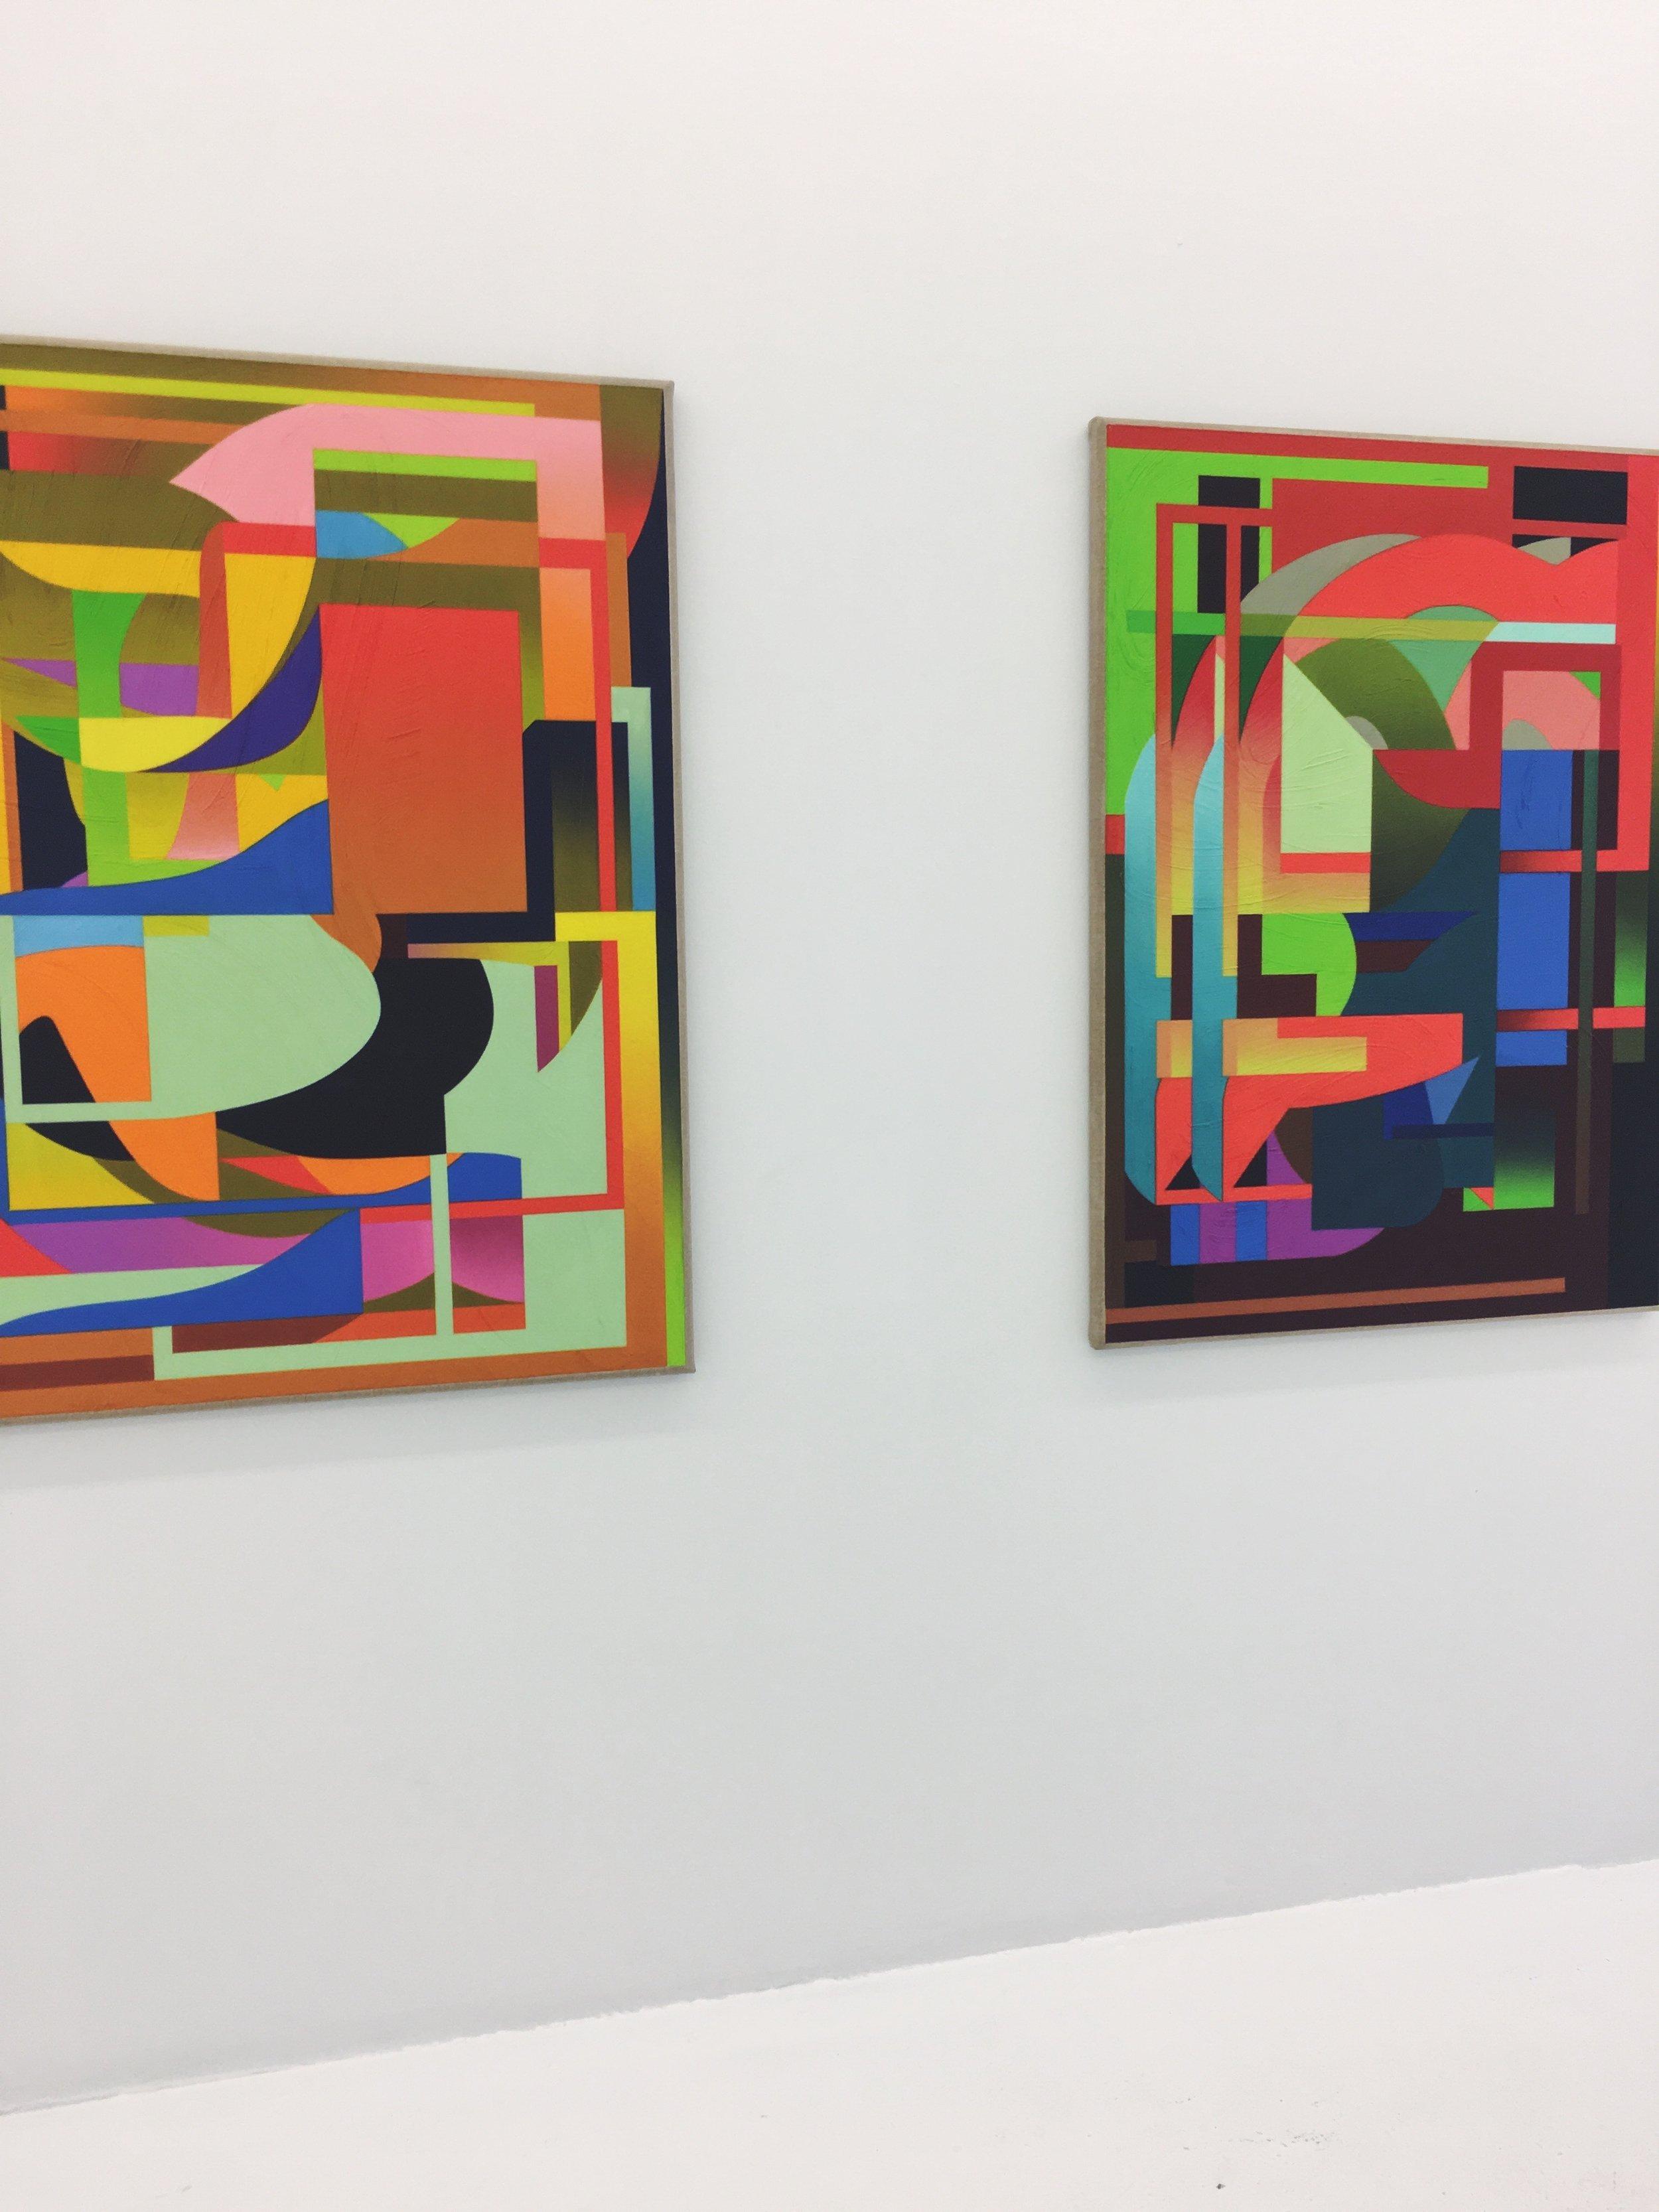 "Mariah Dekkenga, ""Untitled"", 2017, oil on linen, 51 x 37 inches, 129.5 x 94 cm"